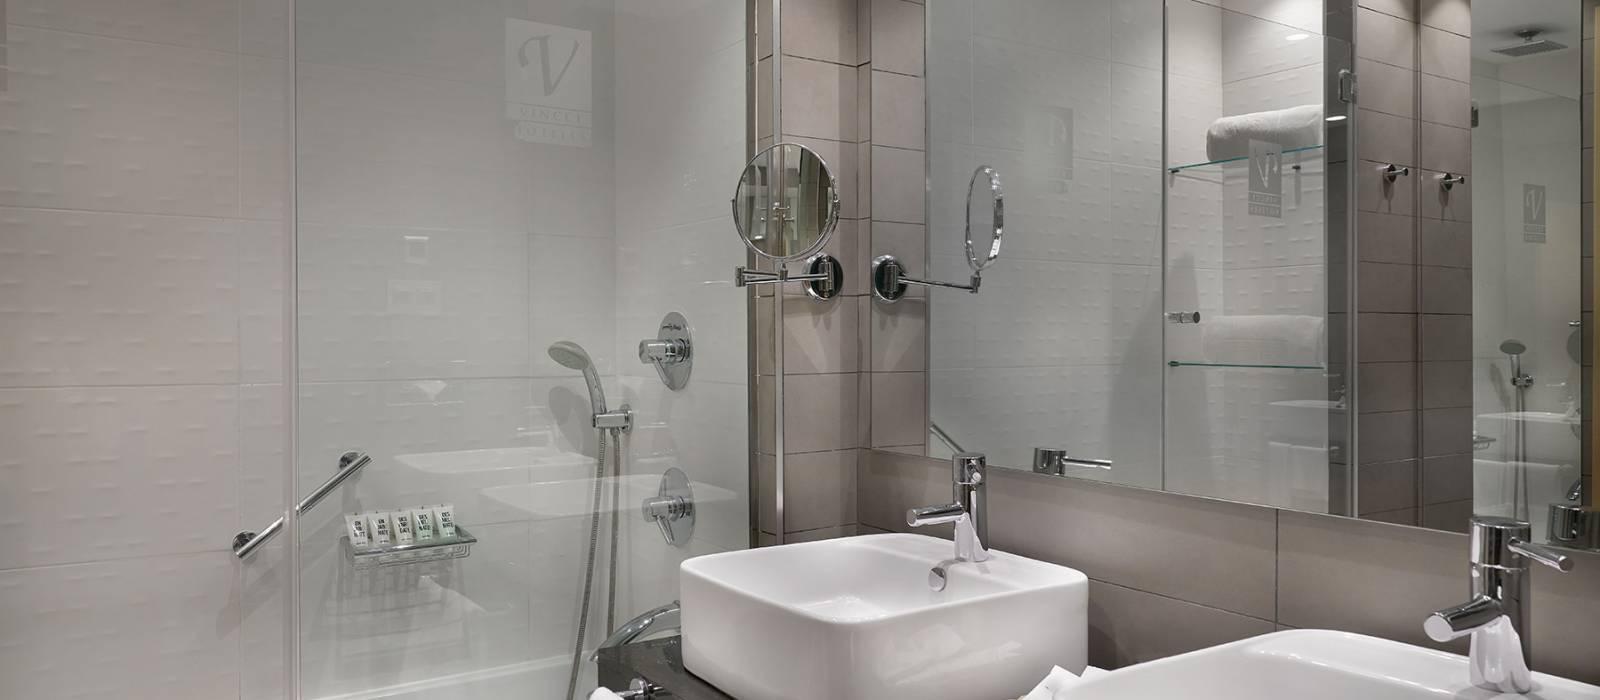 Oferta Anticipada -10% Hotel Vincci Posada del Patio